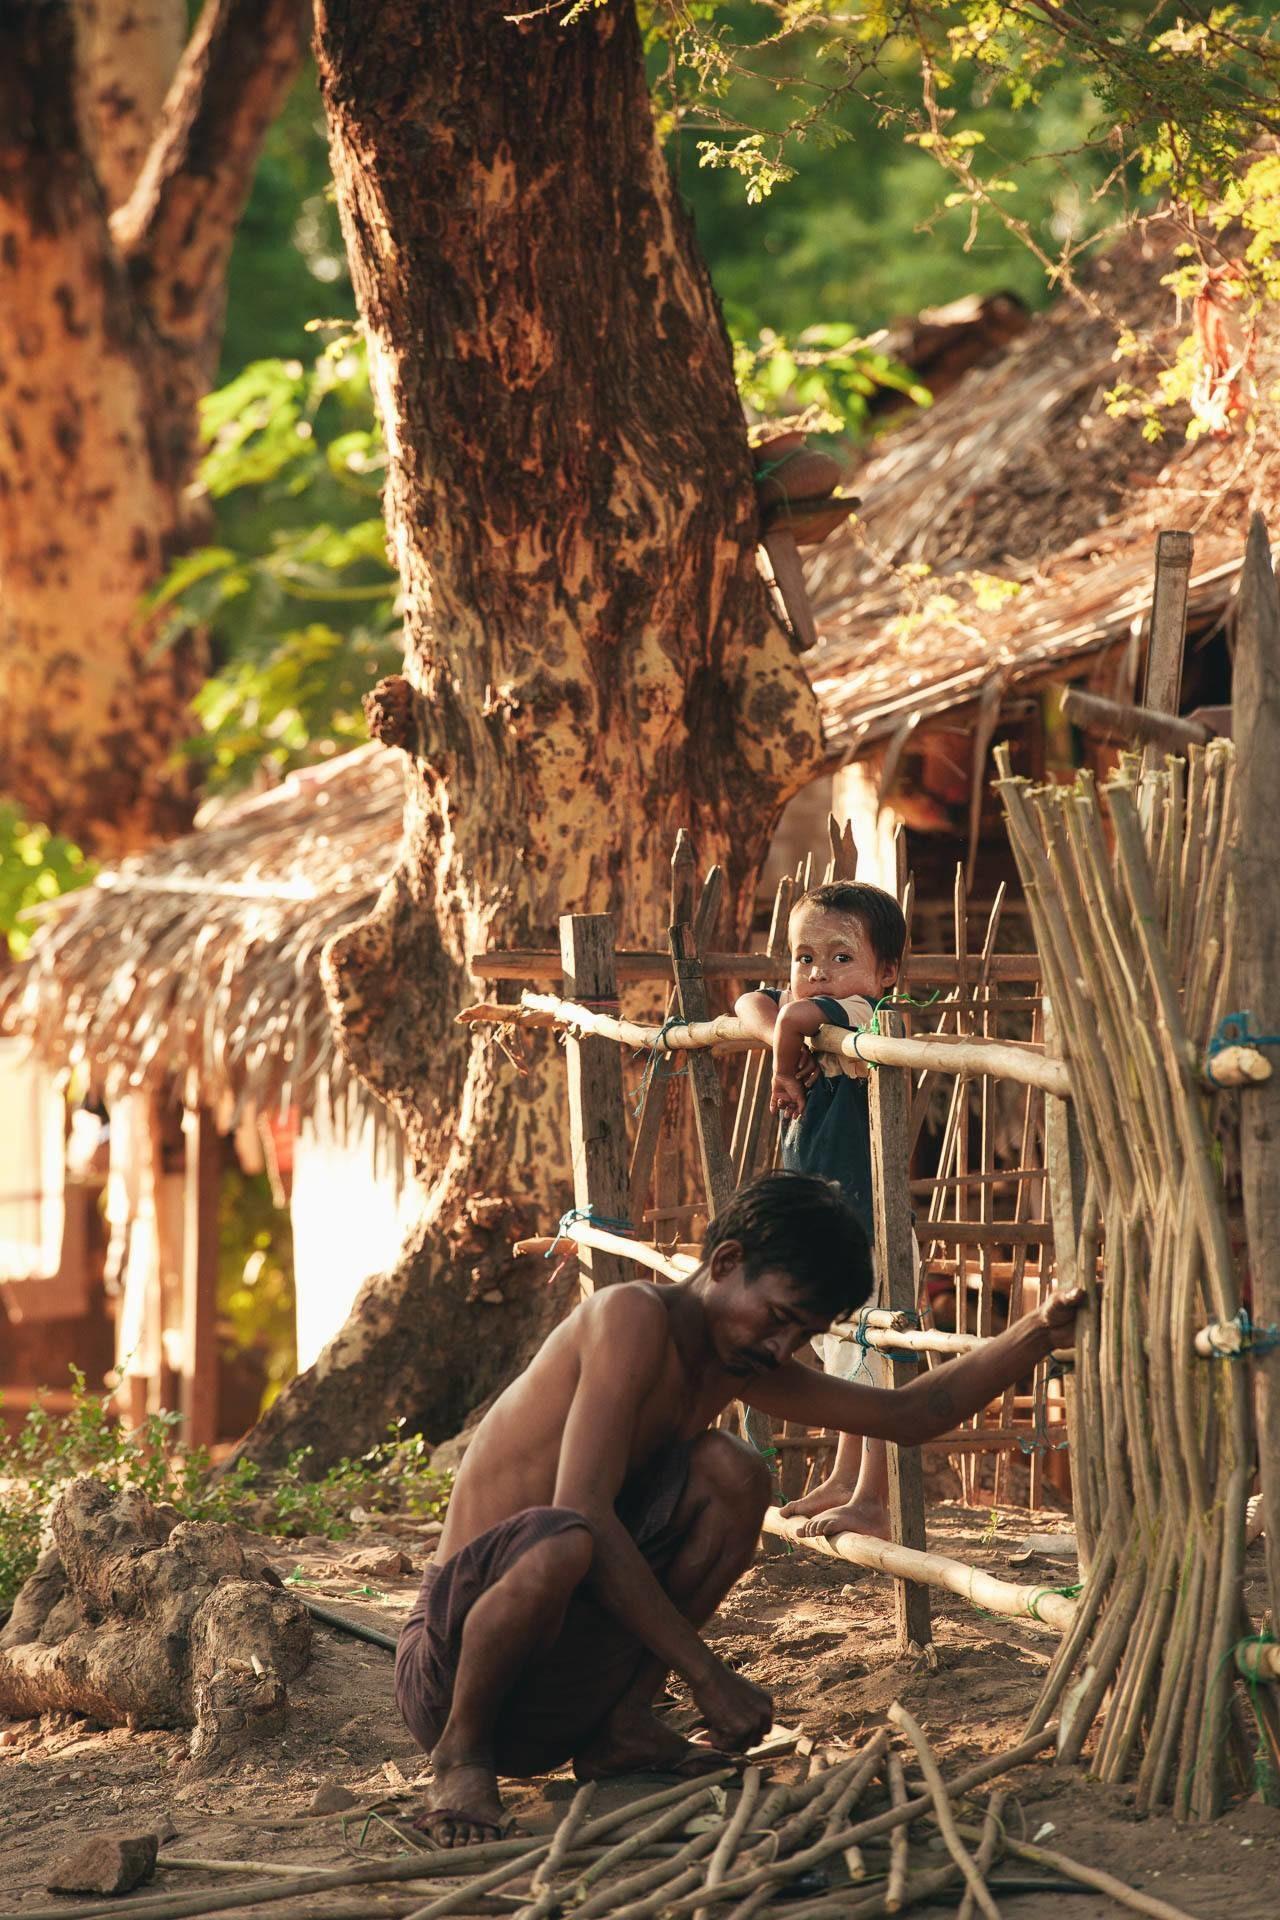 Mann Zaun Kind Myanmar Fotostory von Nils Junker